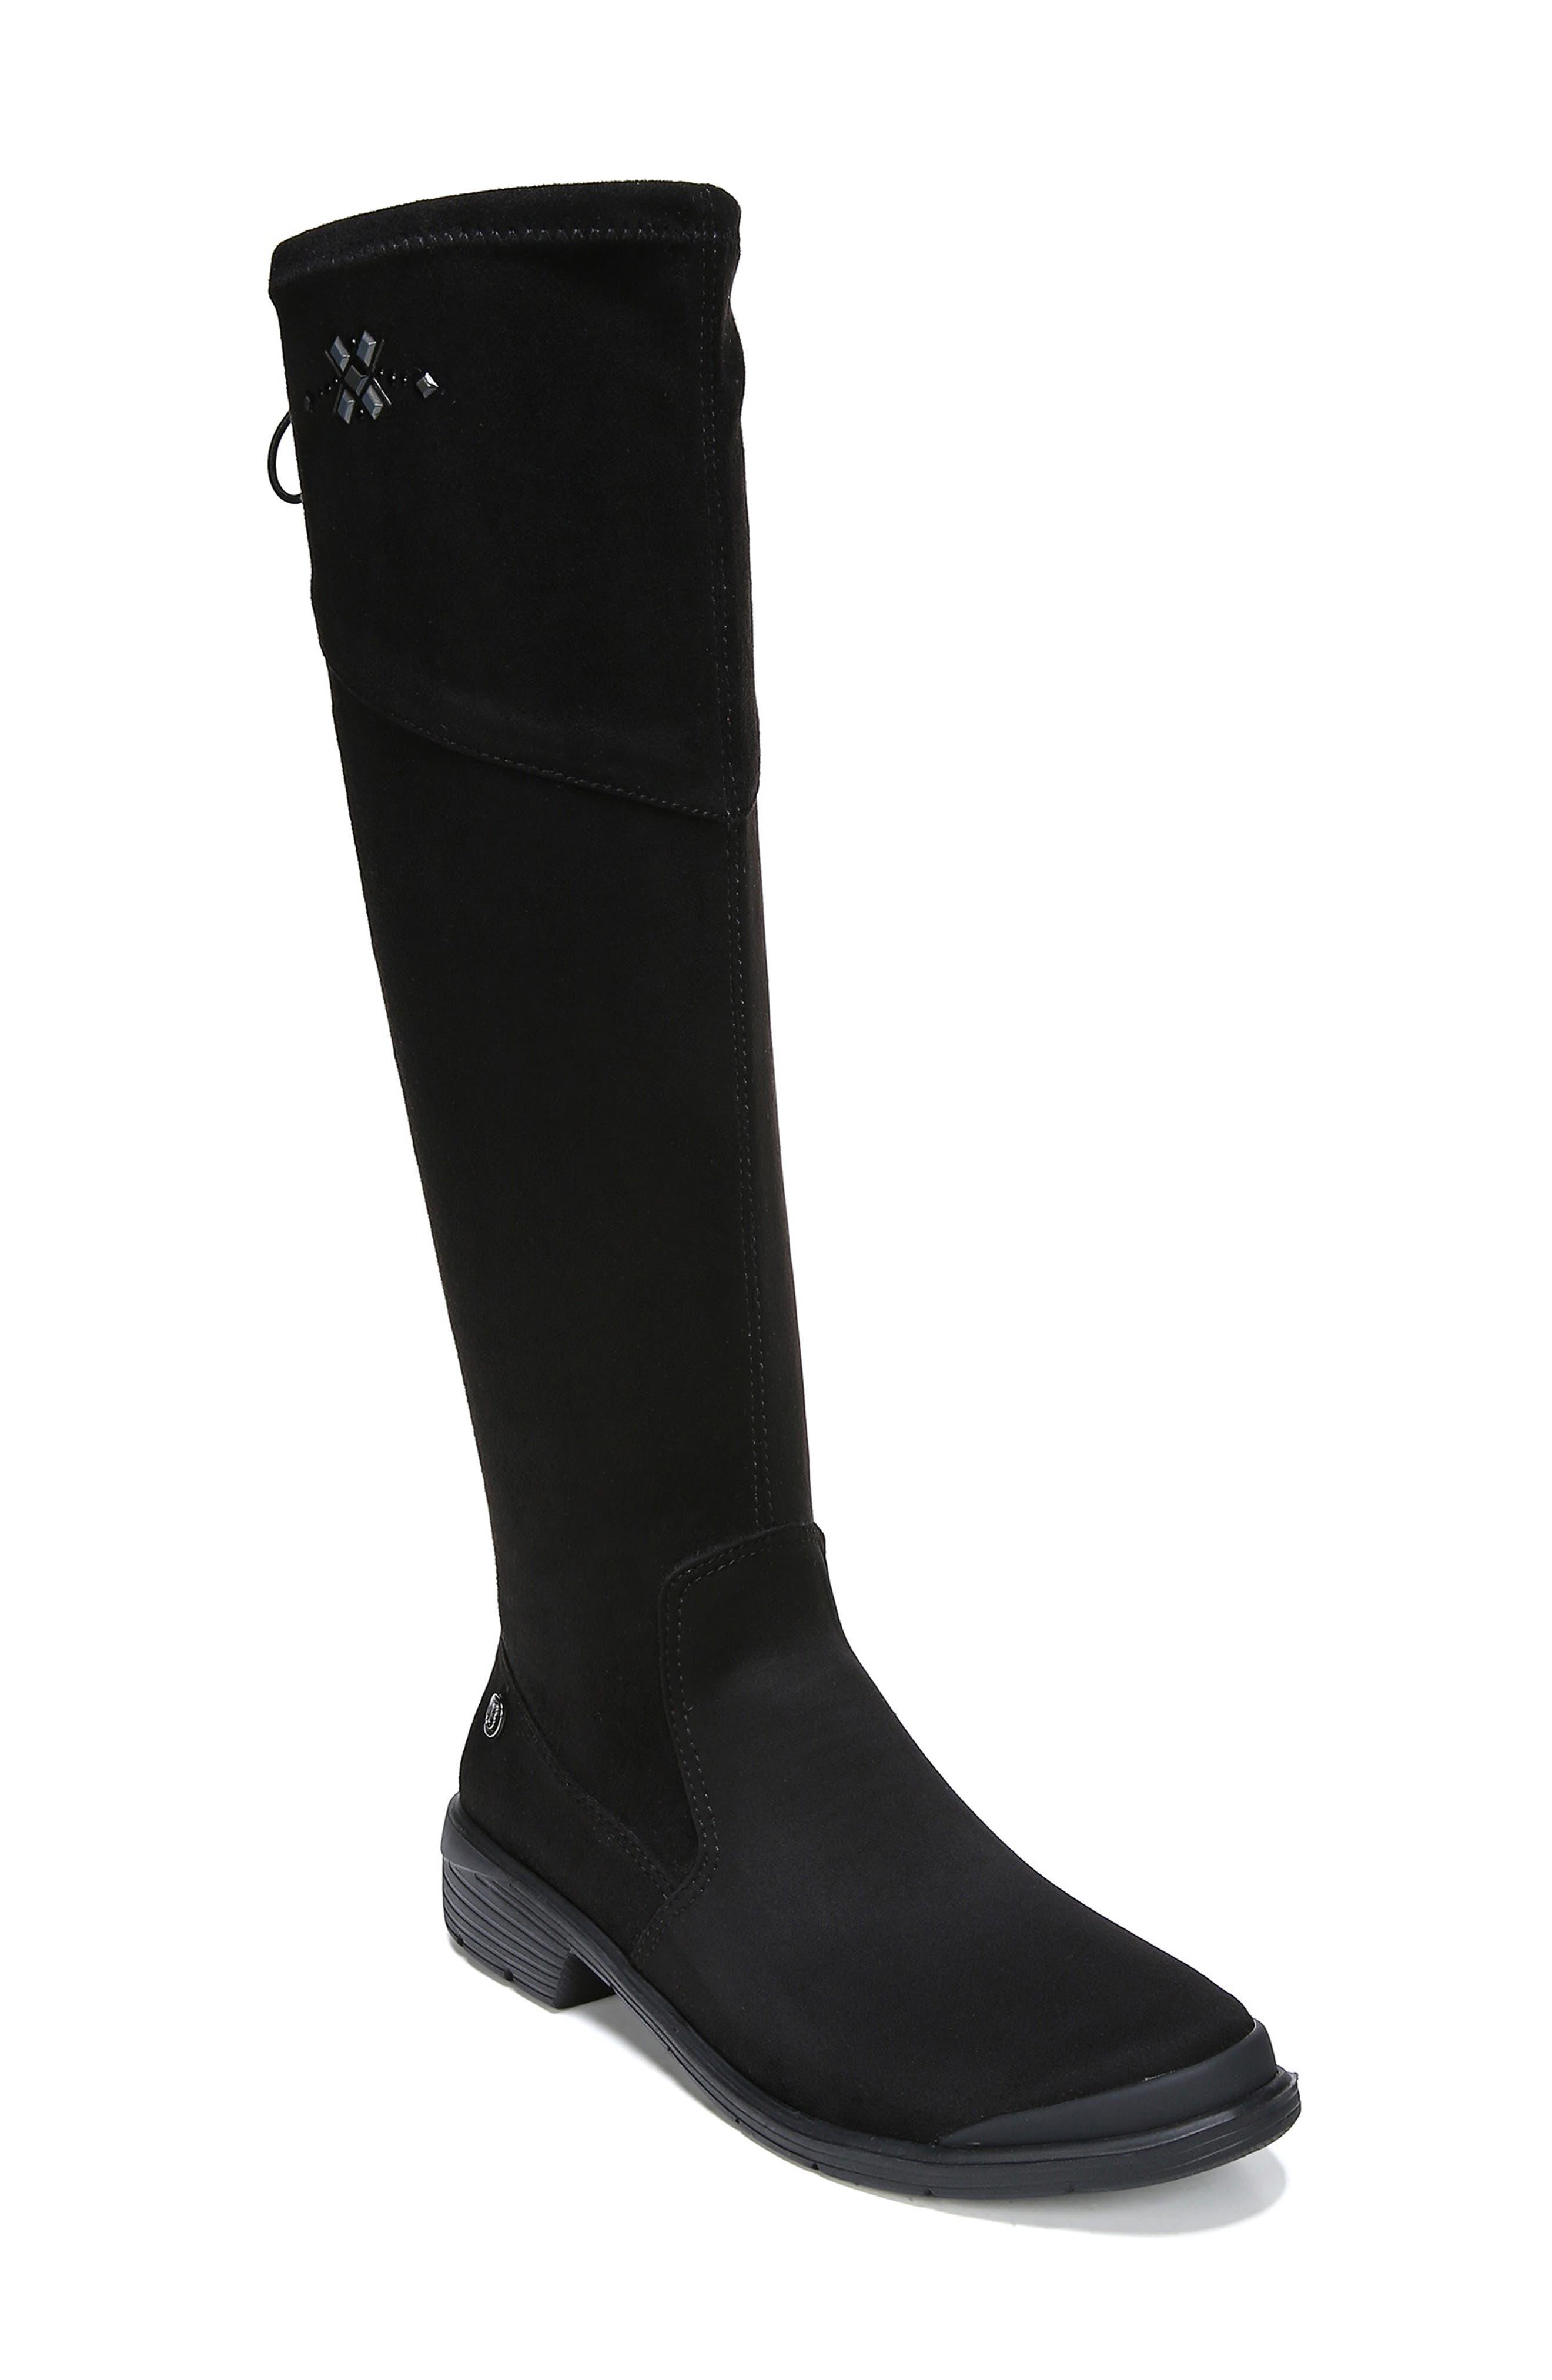 Bzees Boomerang Boot- Black